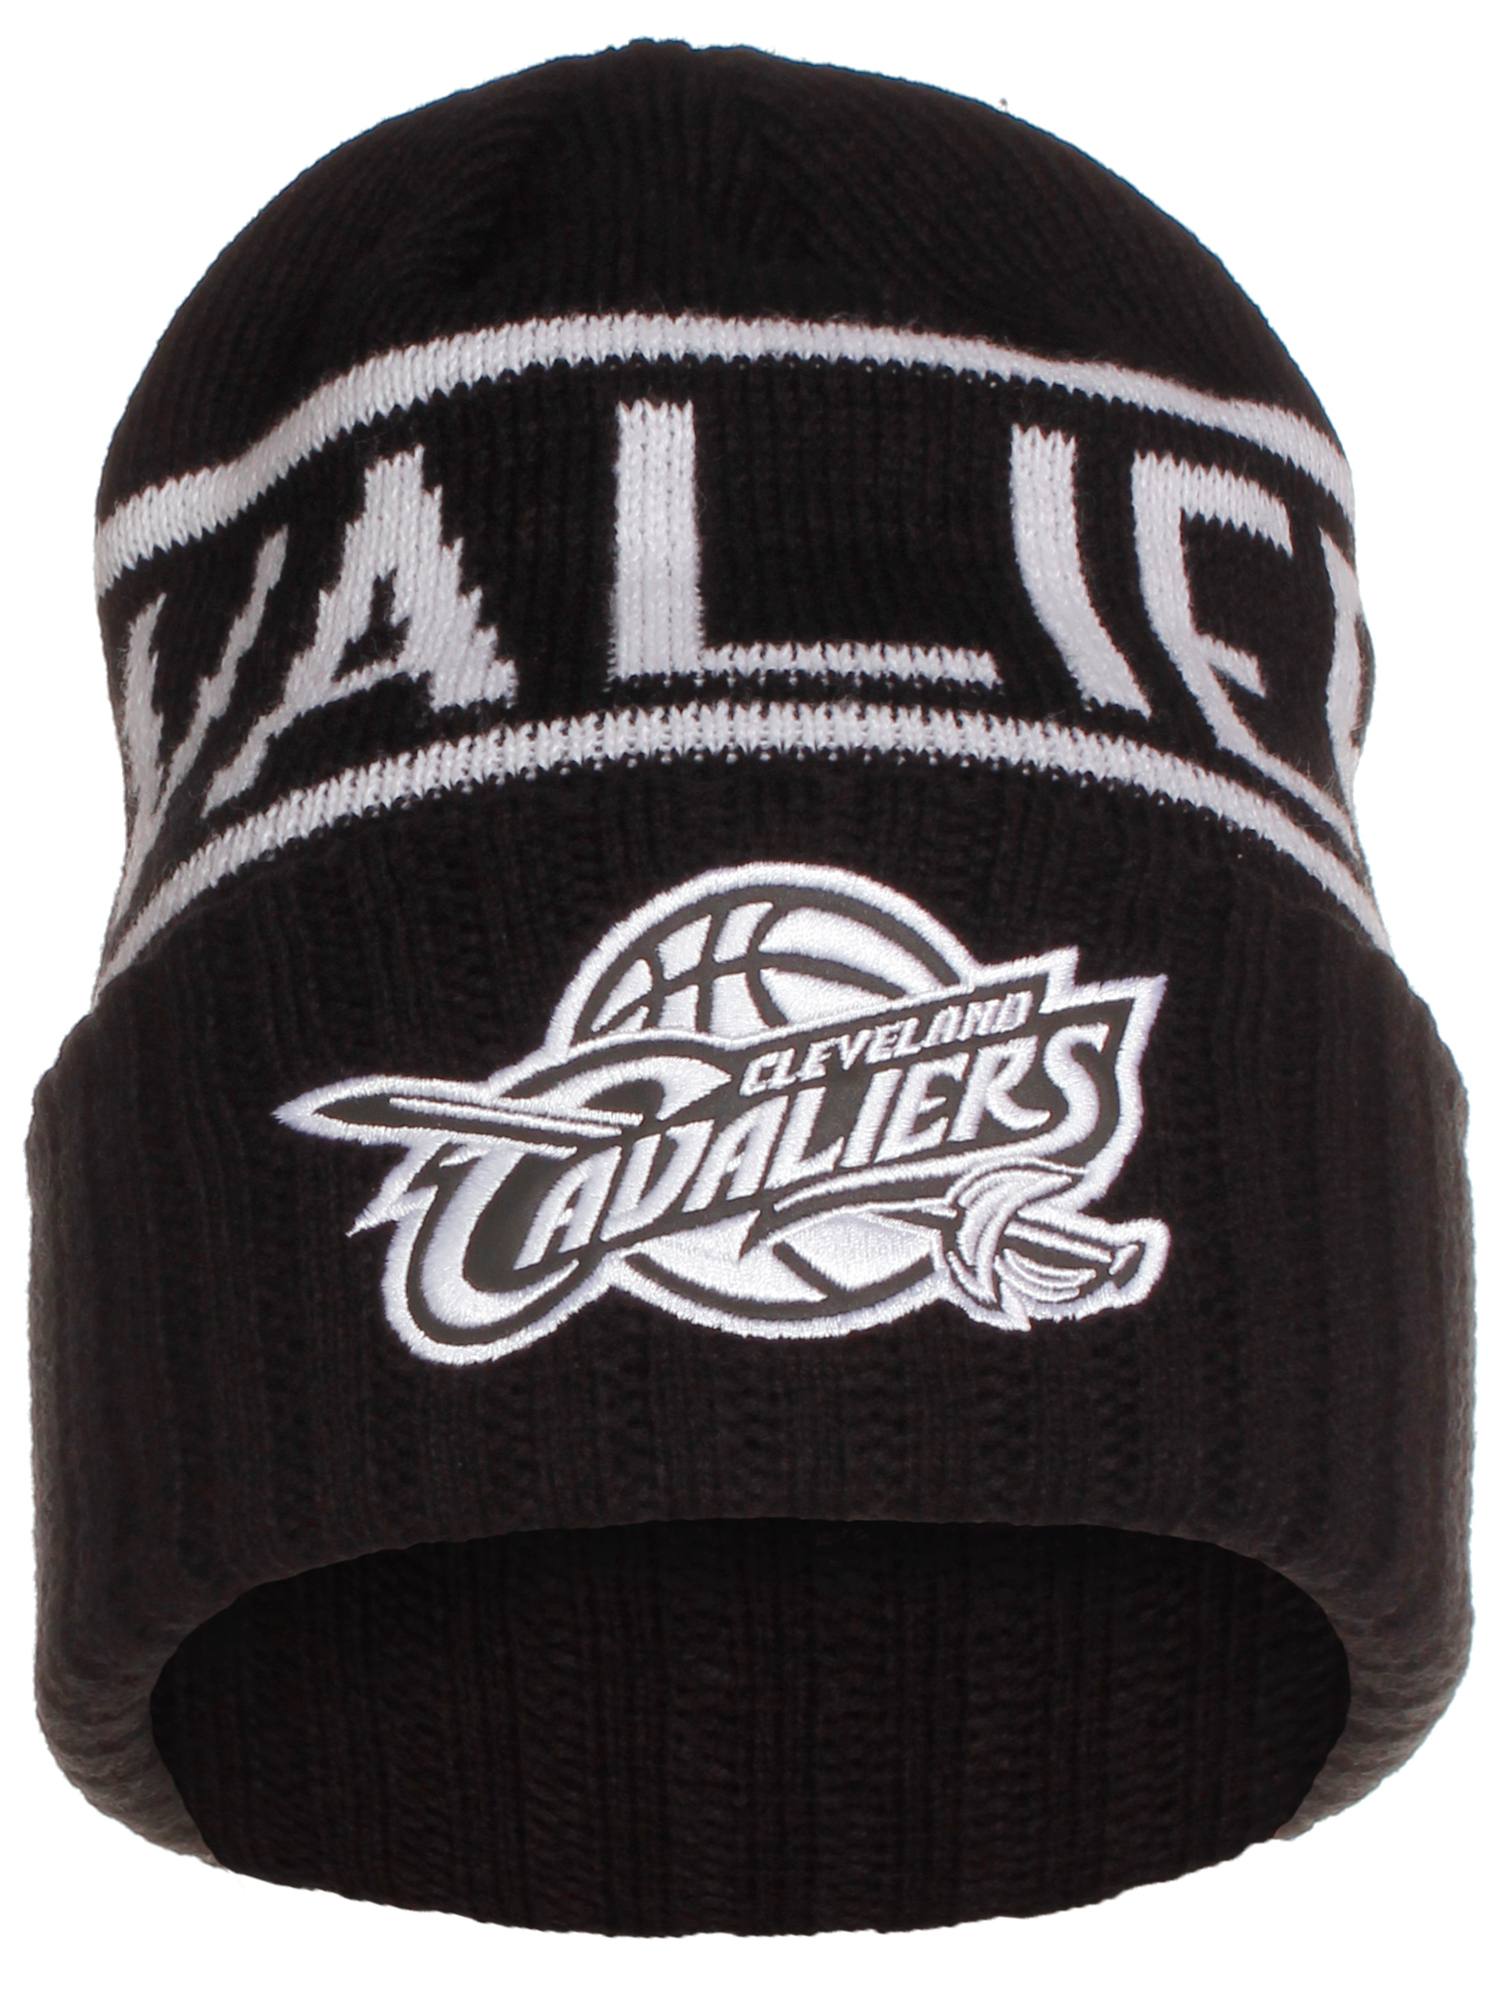 c75bd7110dd Mitchell   Ness NBA Cleveland Cavaliers Cuffed Beanie Knit Hat ...